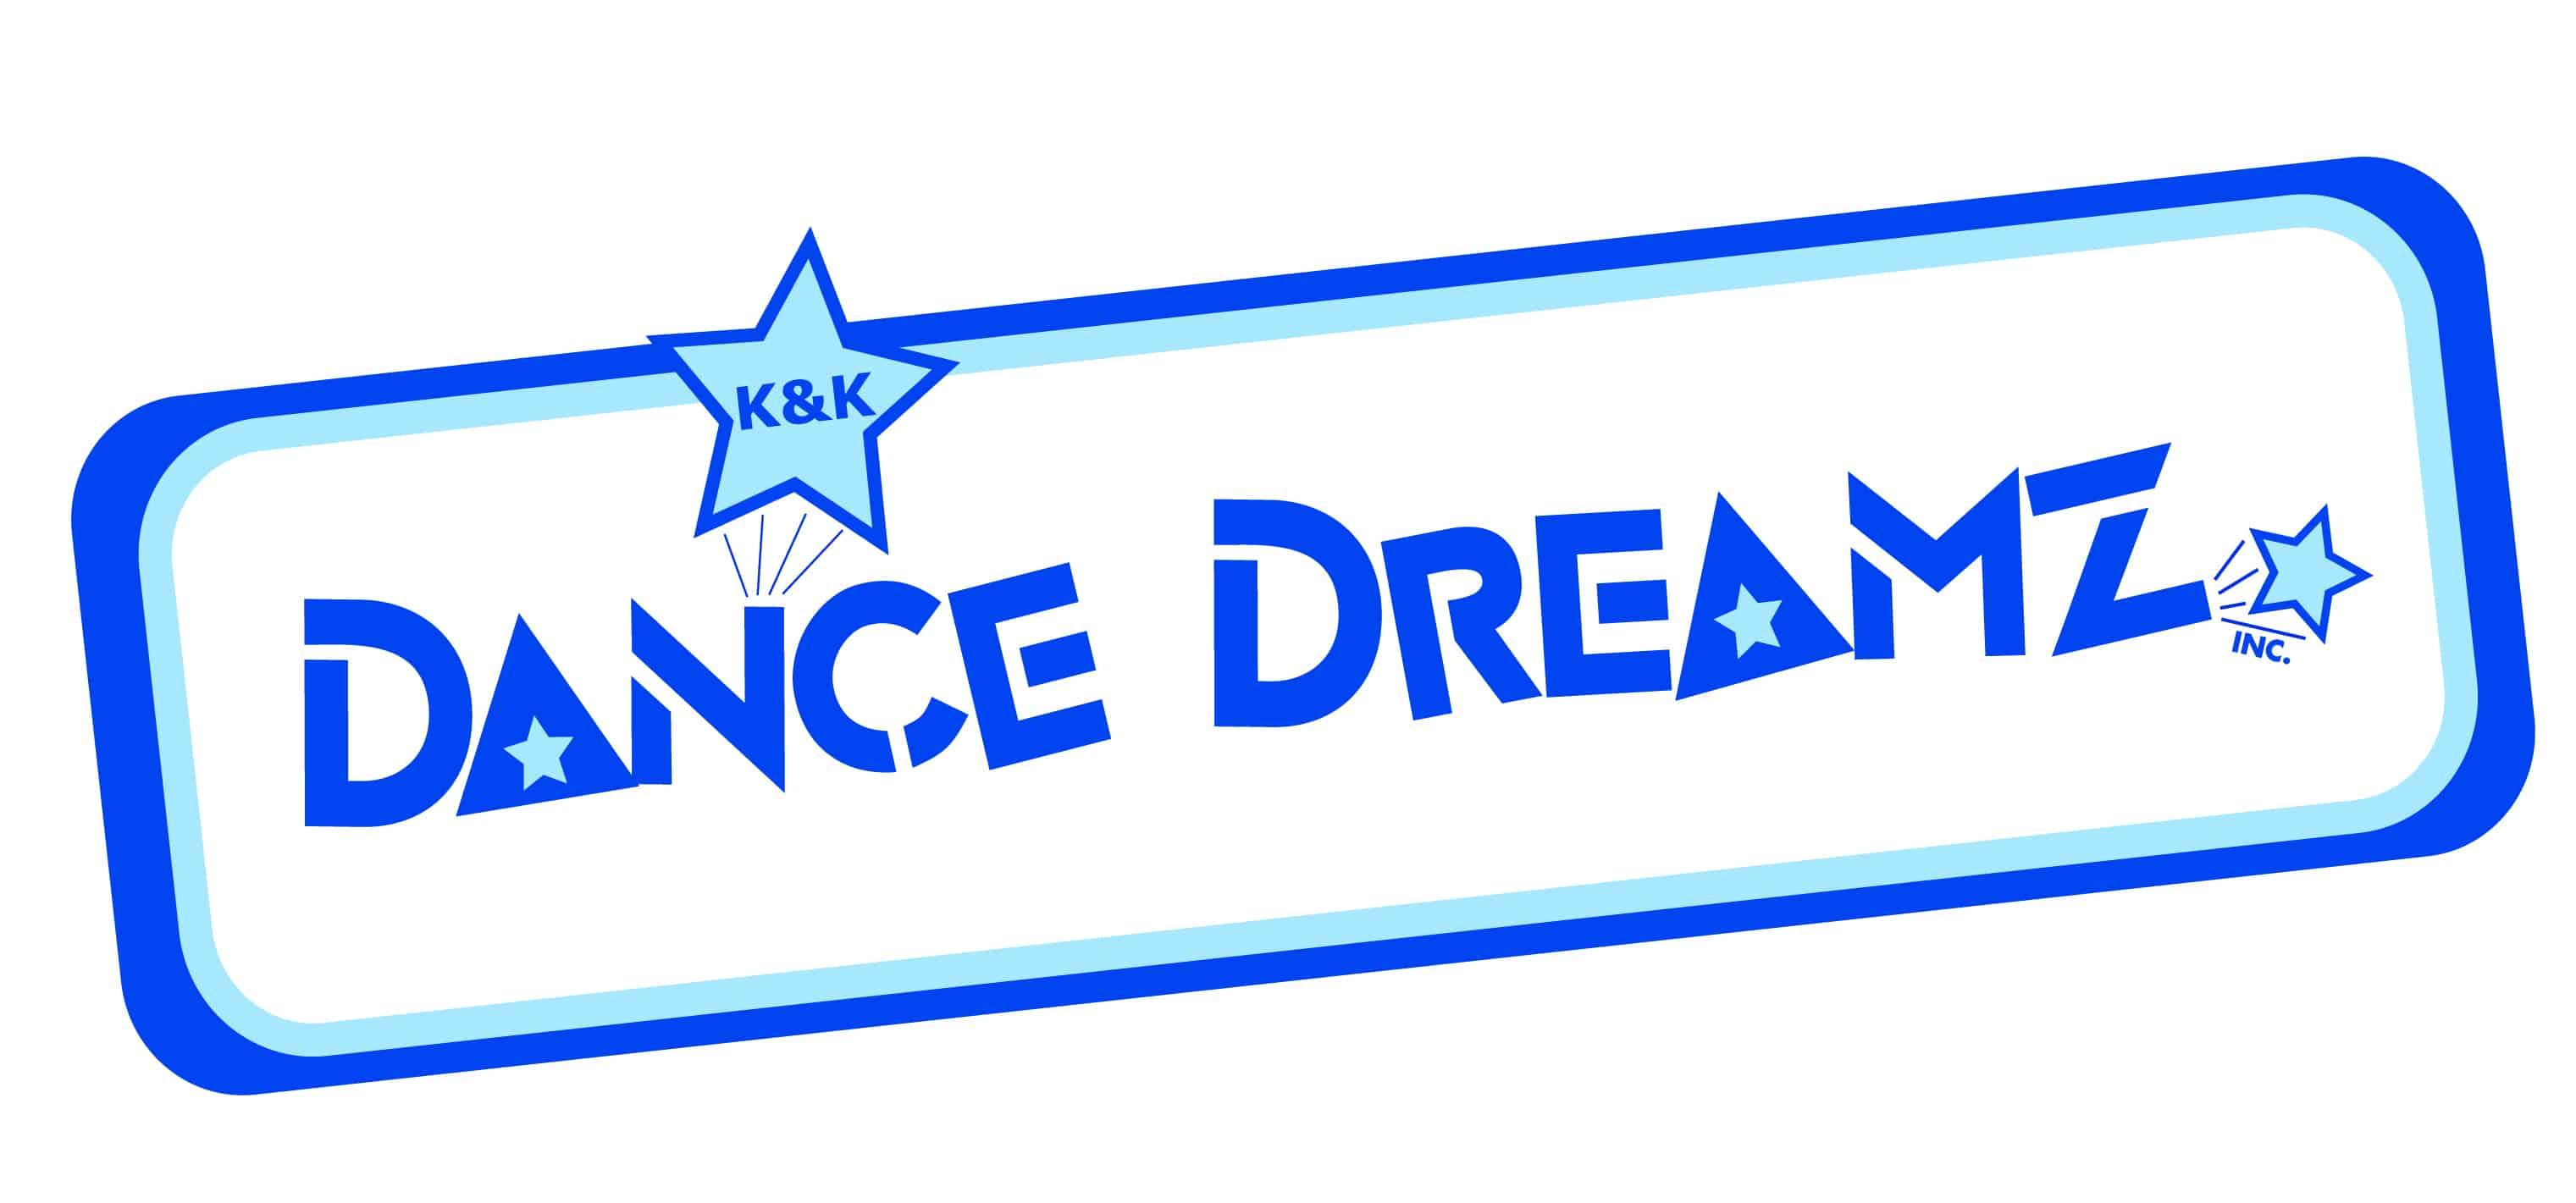 K&K Dance Dreamz